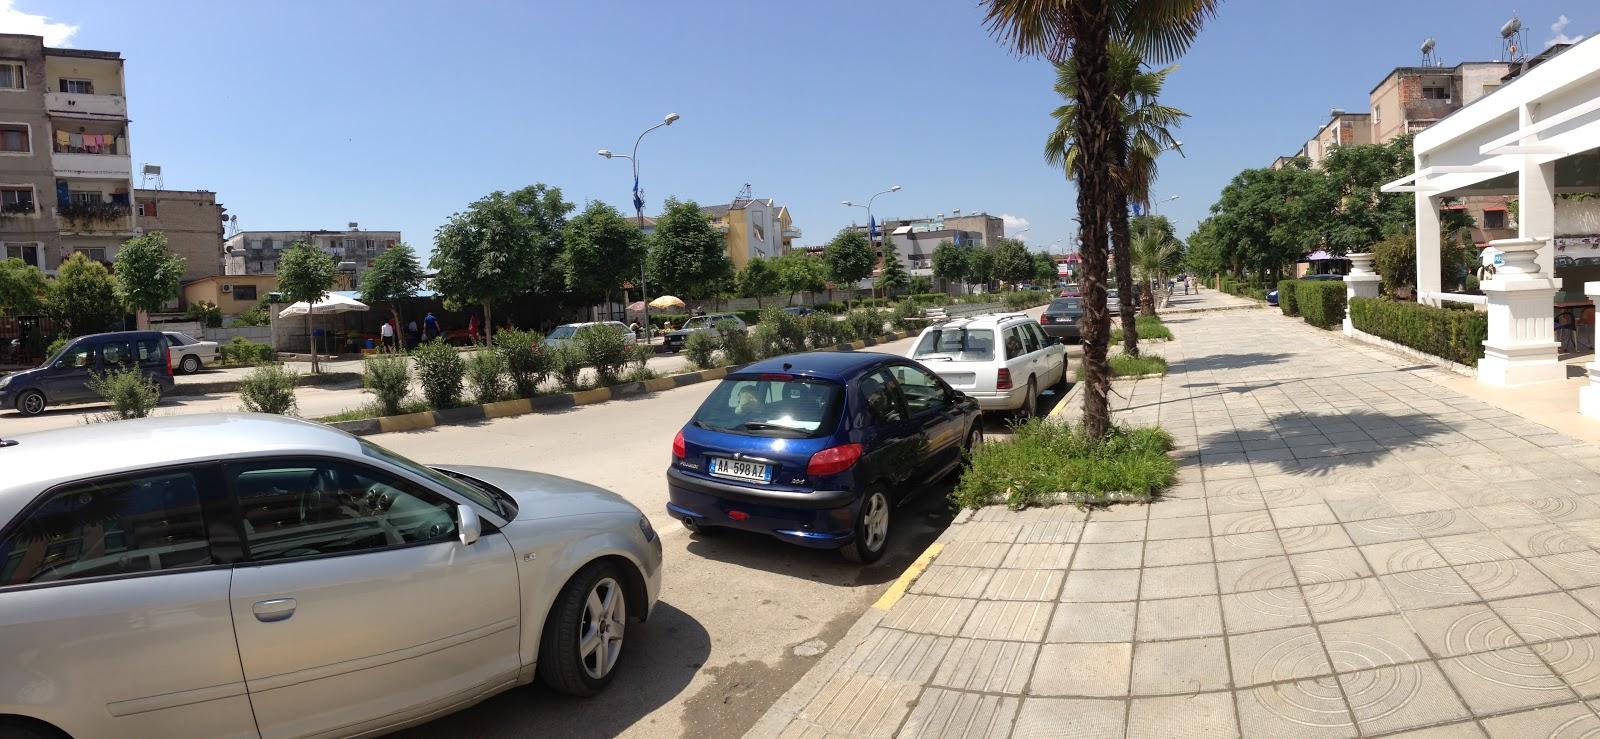 Day 15 - 2013-06-08 – Elbasan, Albania to Struga, Macedonia - IMG_0988.JPG